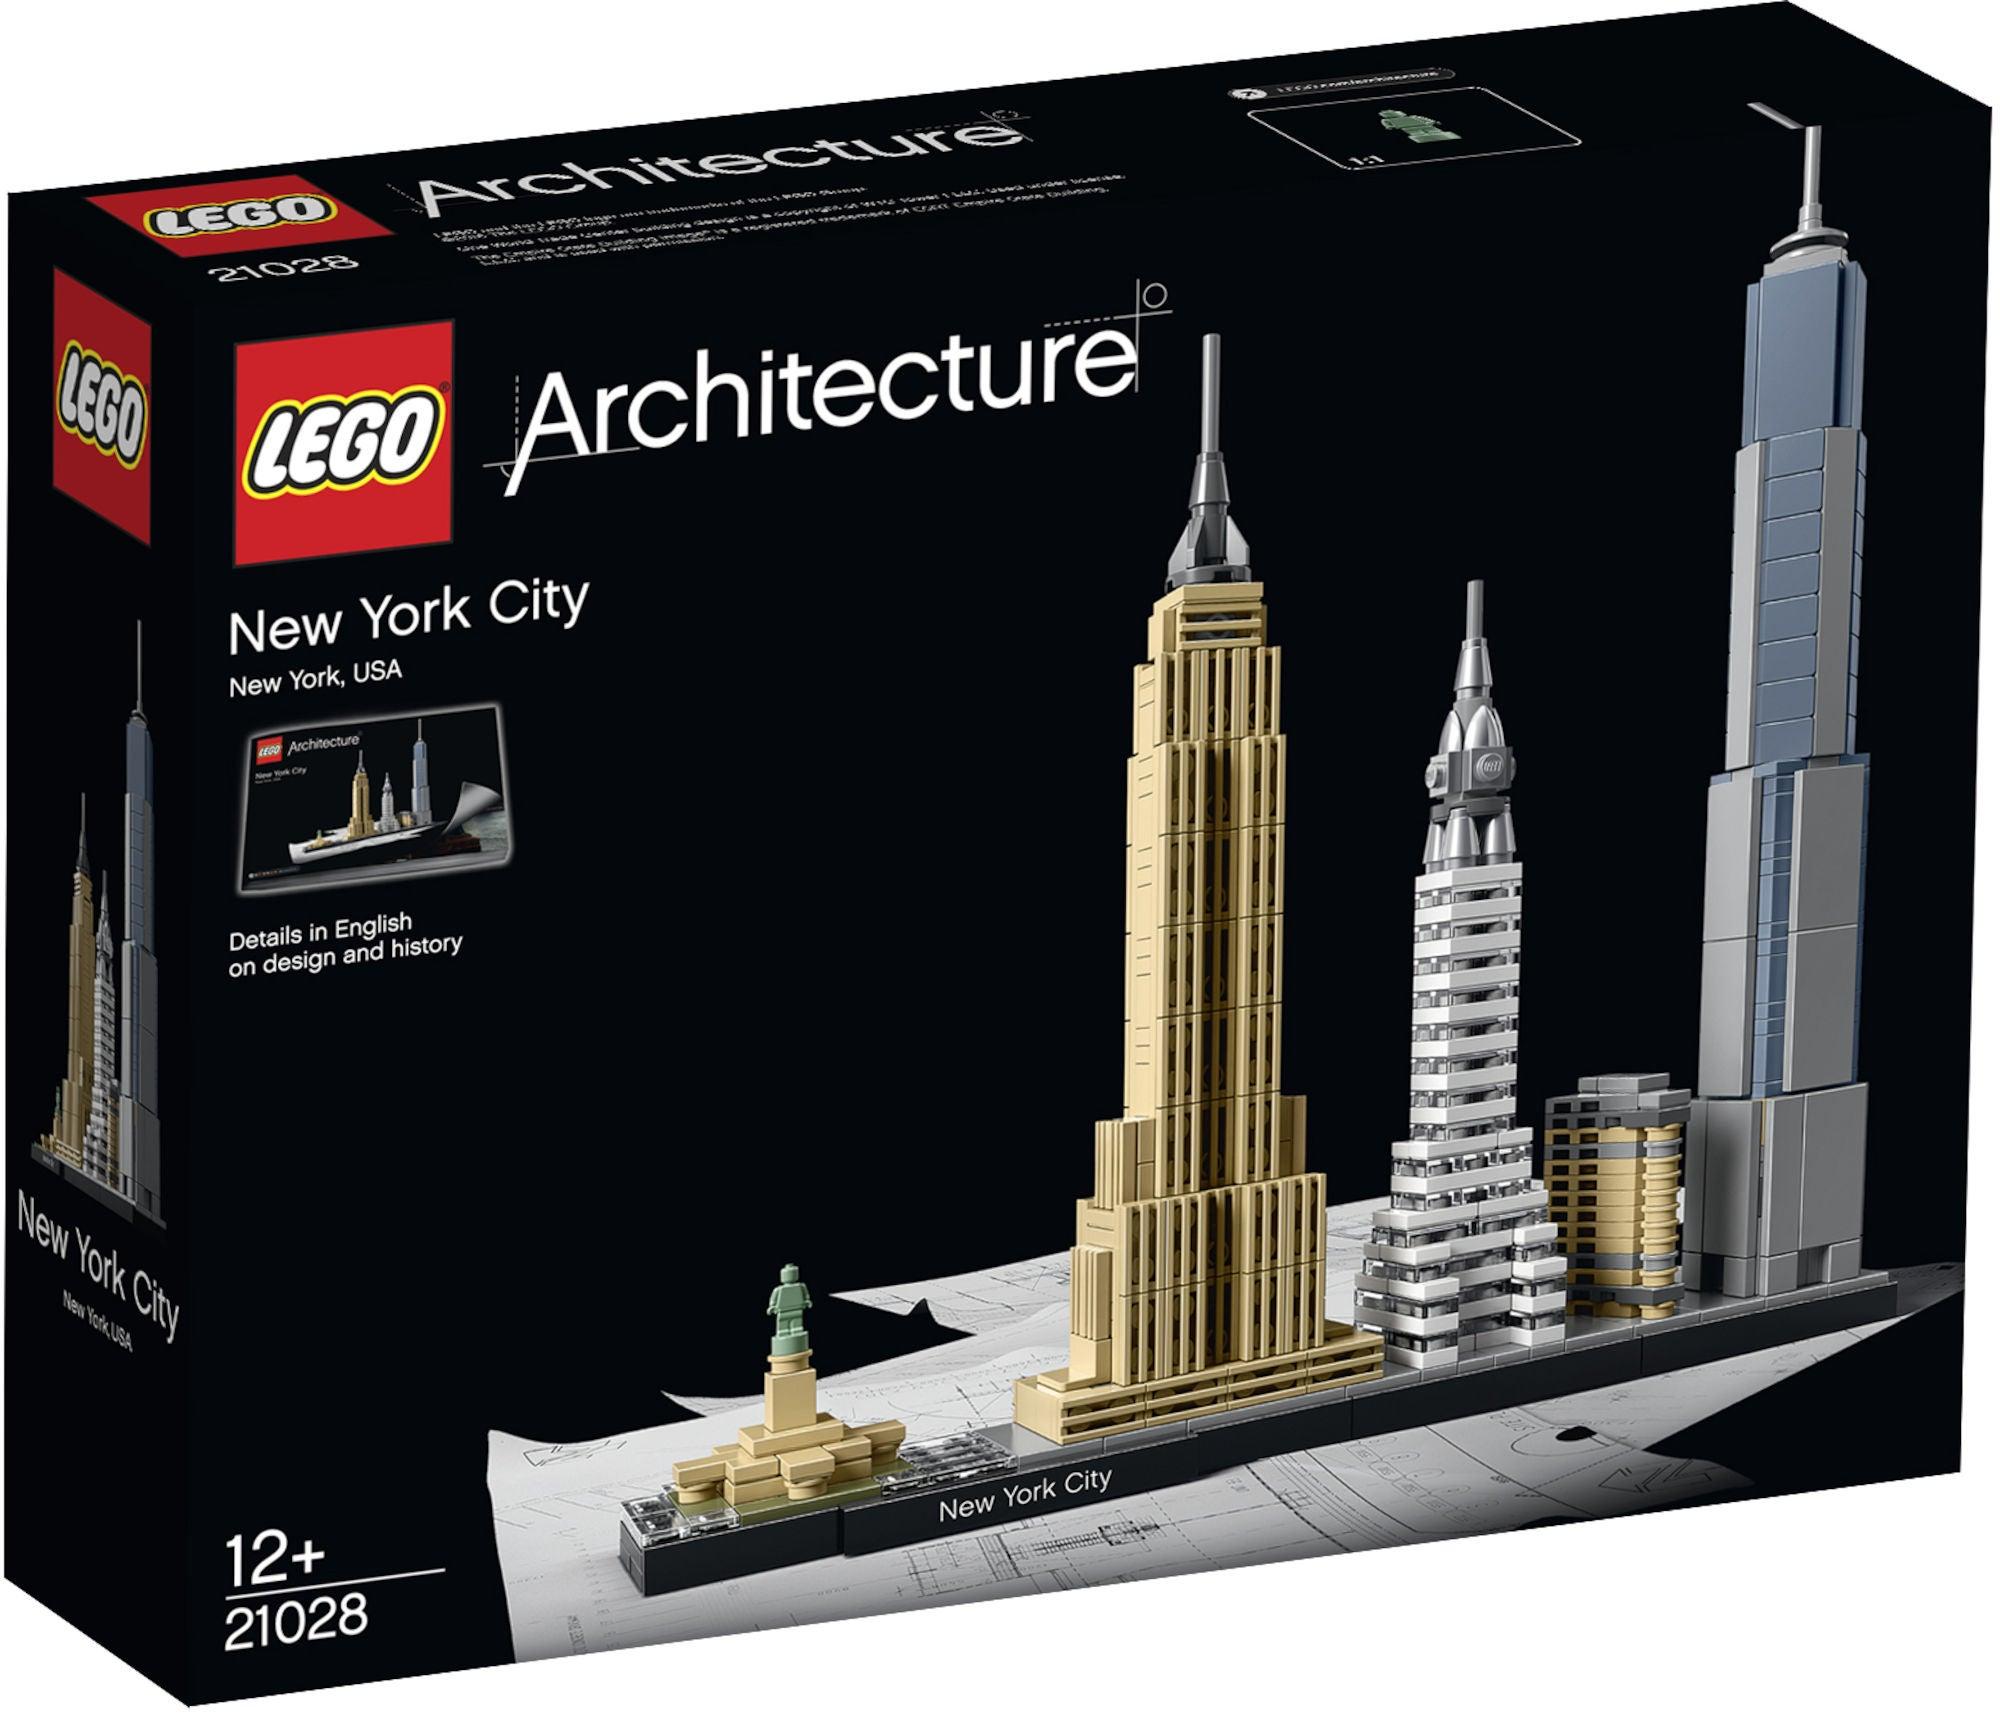 LEGO Architecture 21028 New York City